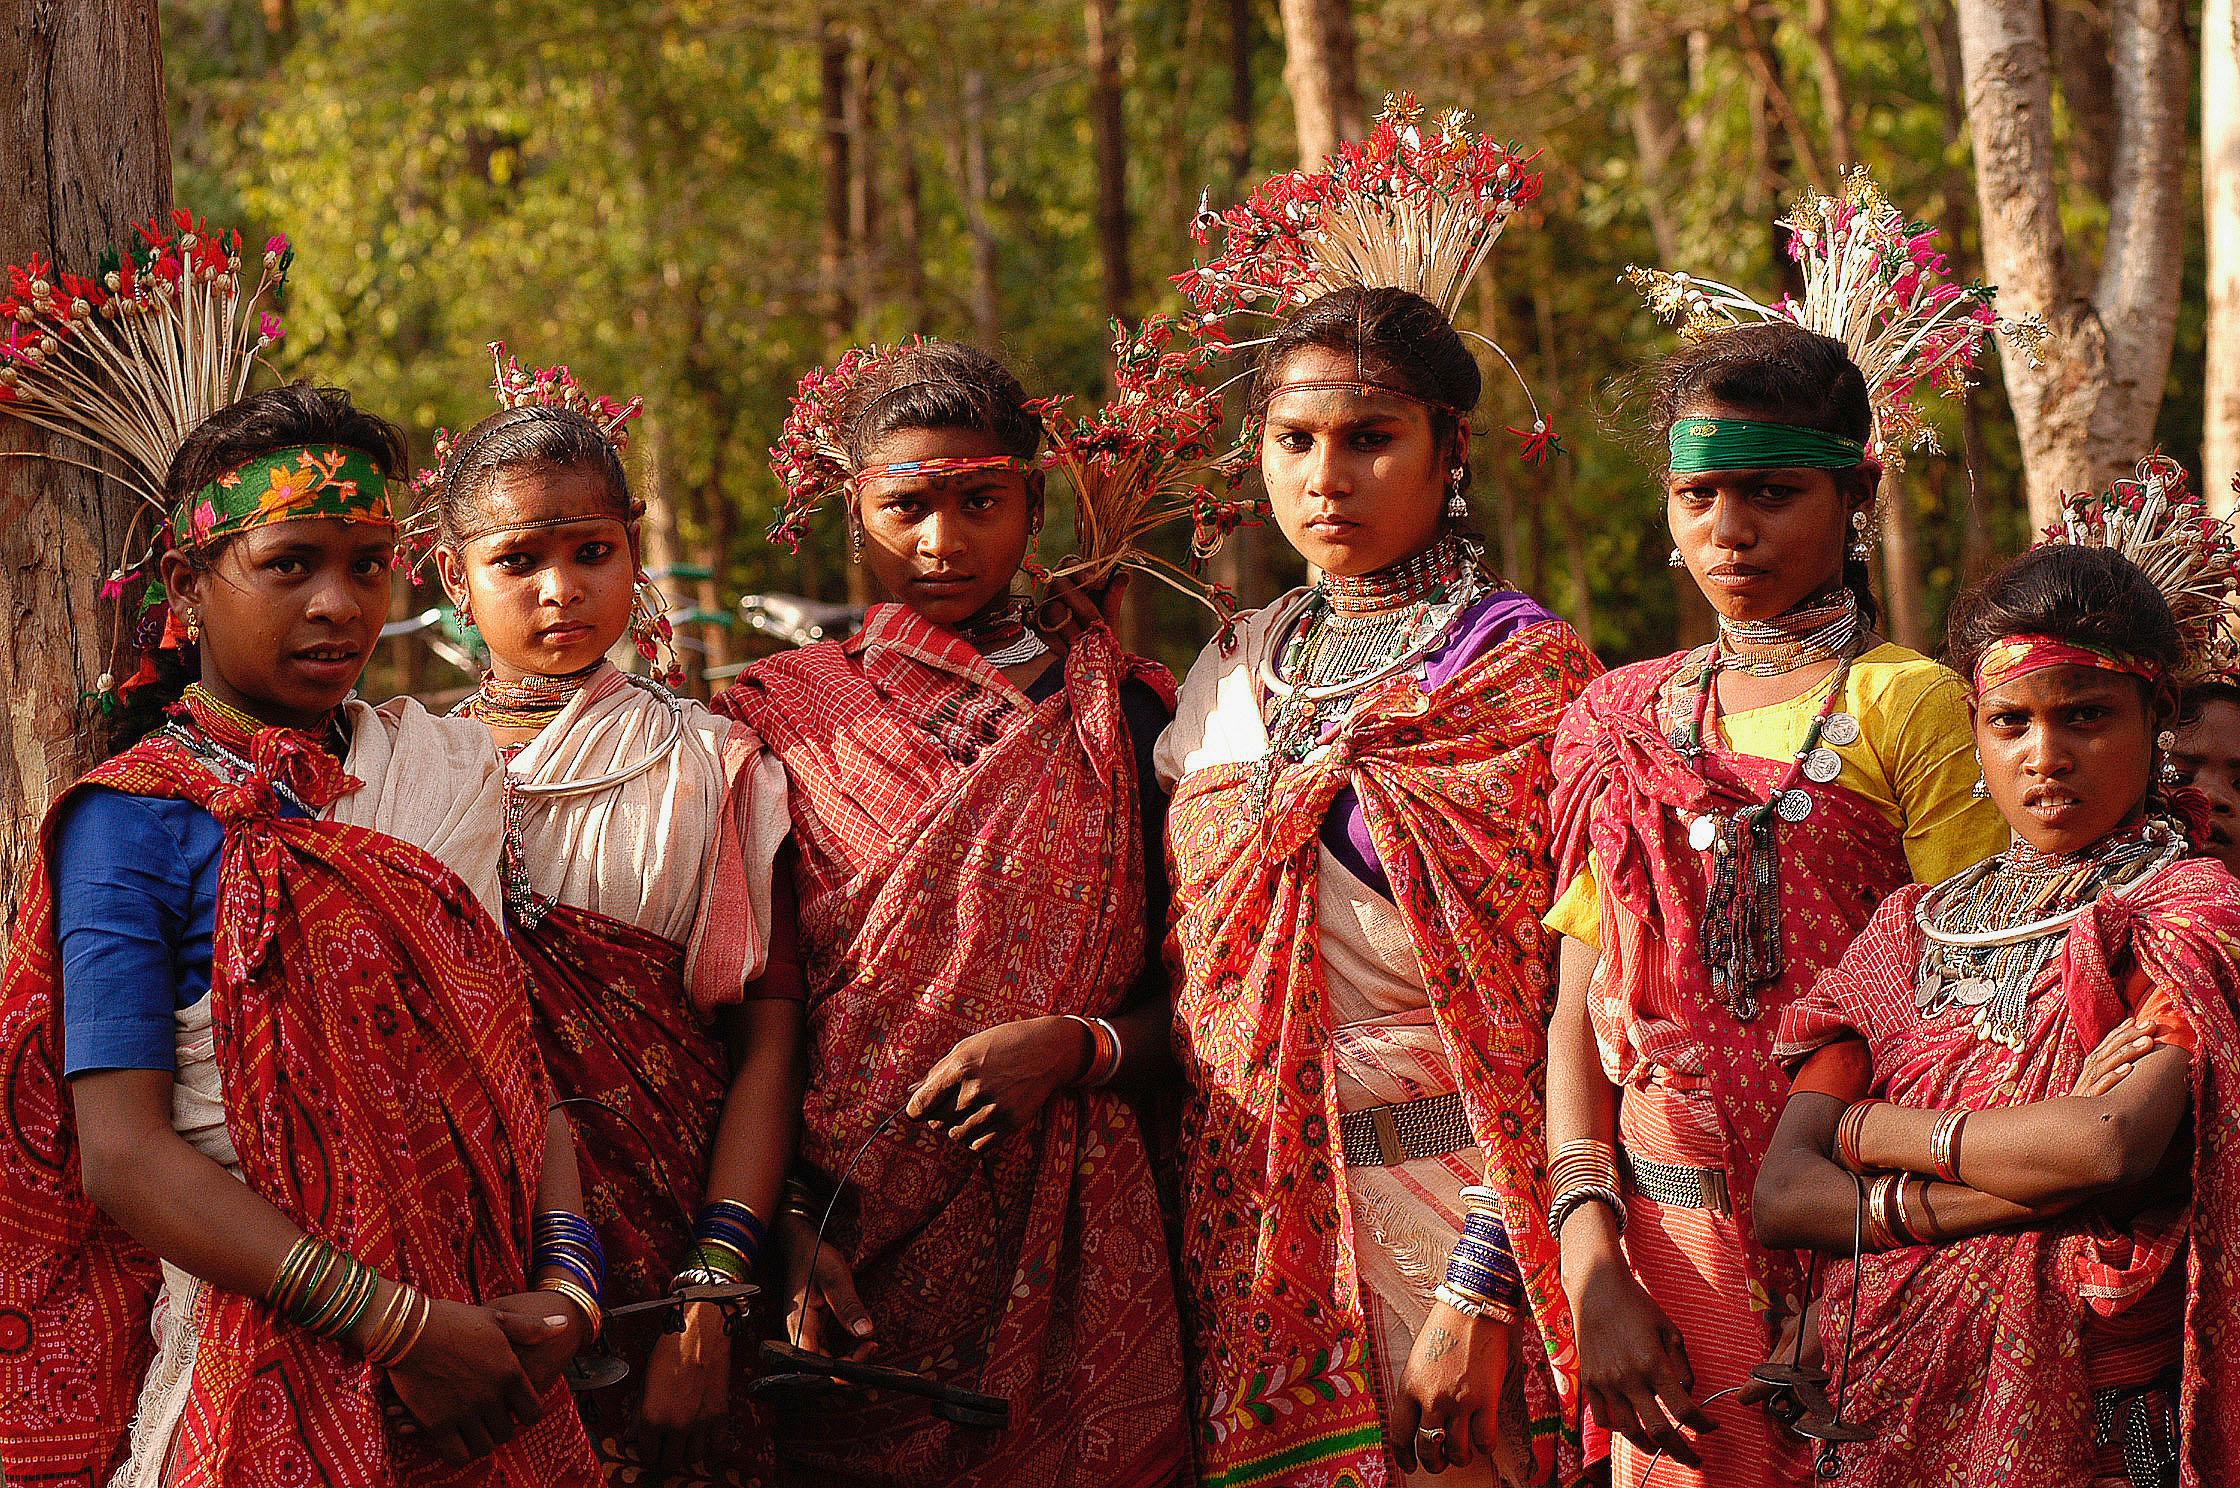 Young_Baiga_women,_India_tribal